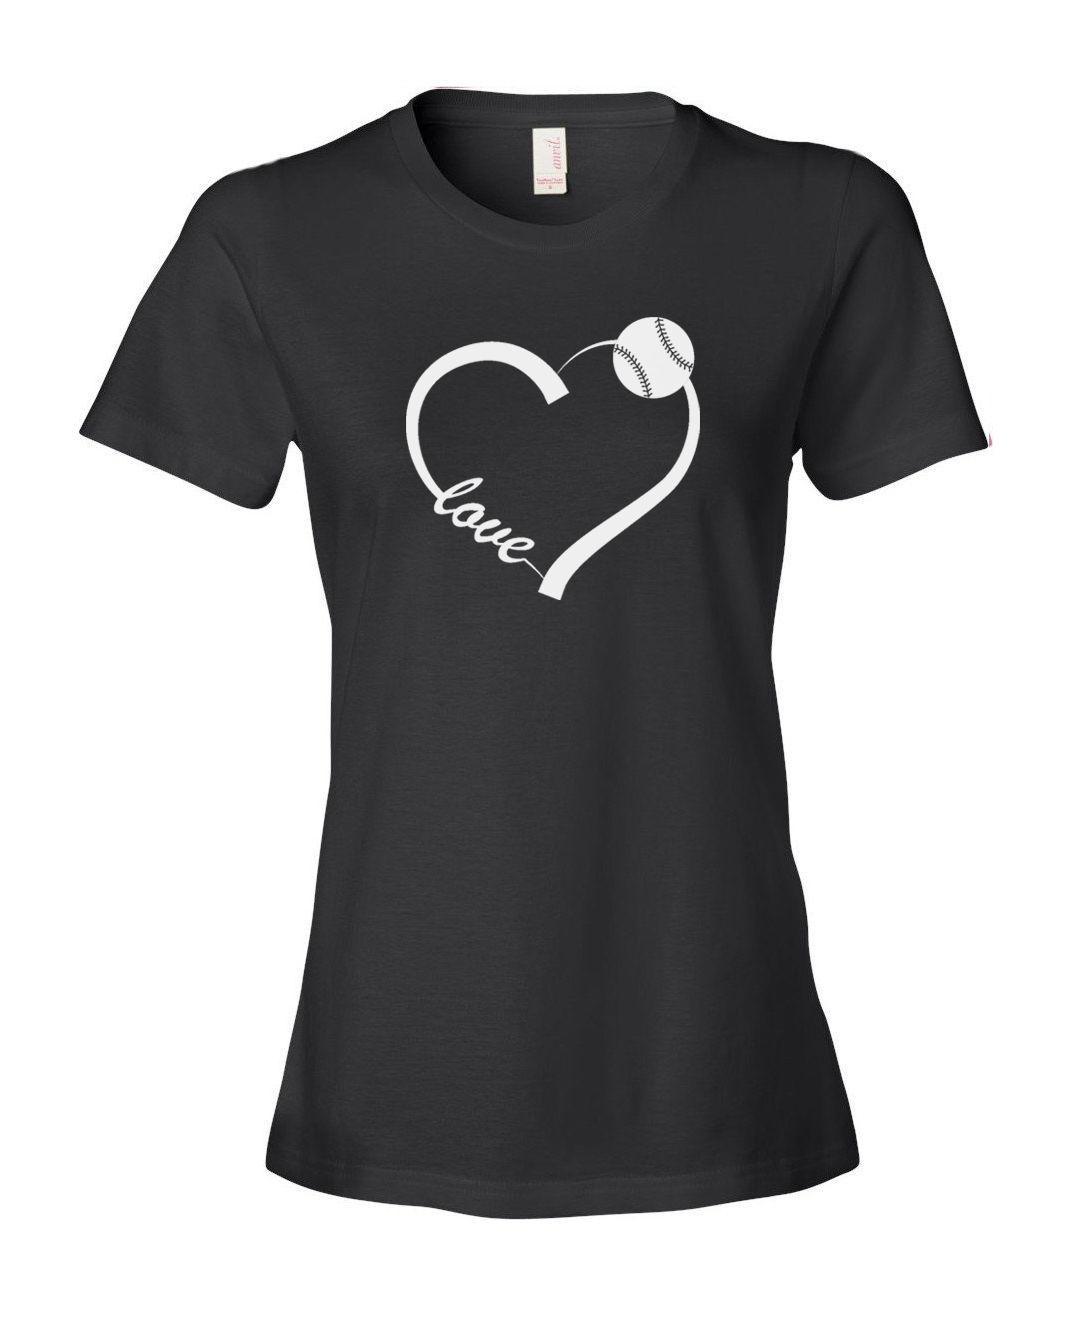 70cb5c2f Women's Tee Love Heart Baseball Softball Women's Ladies' Fashion Fit T  Shirt Shirt